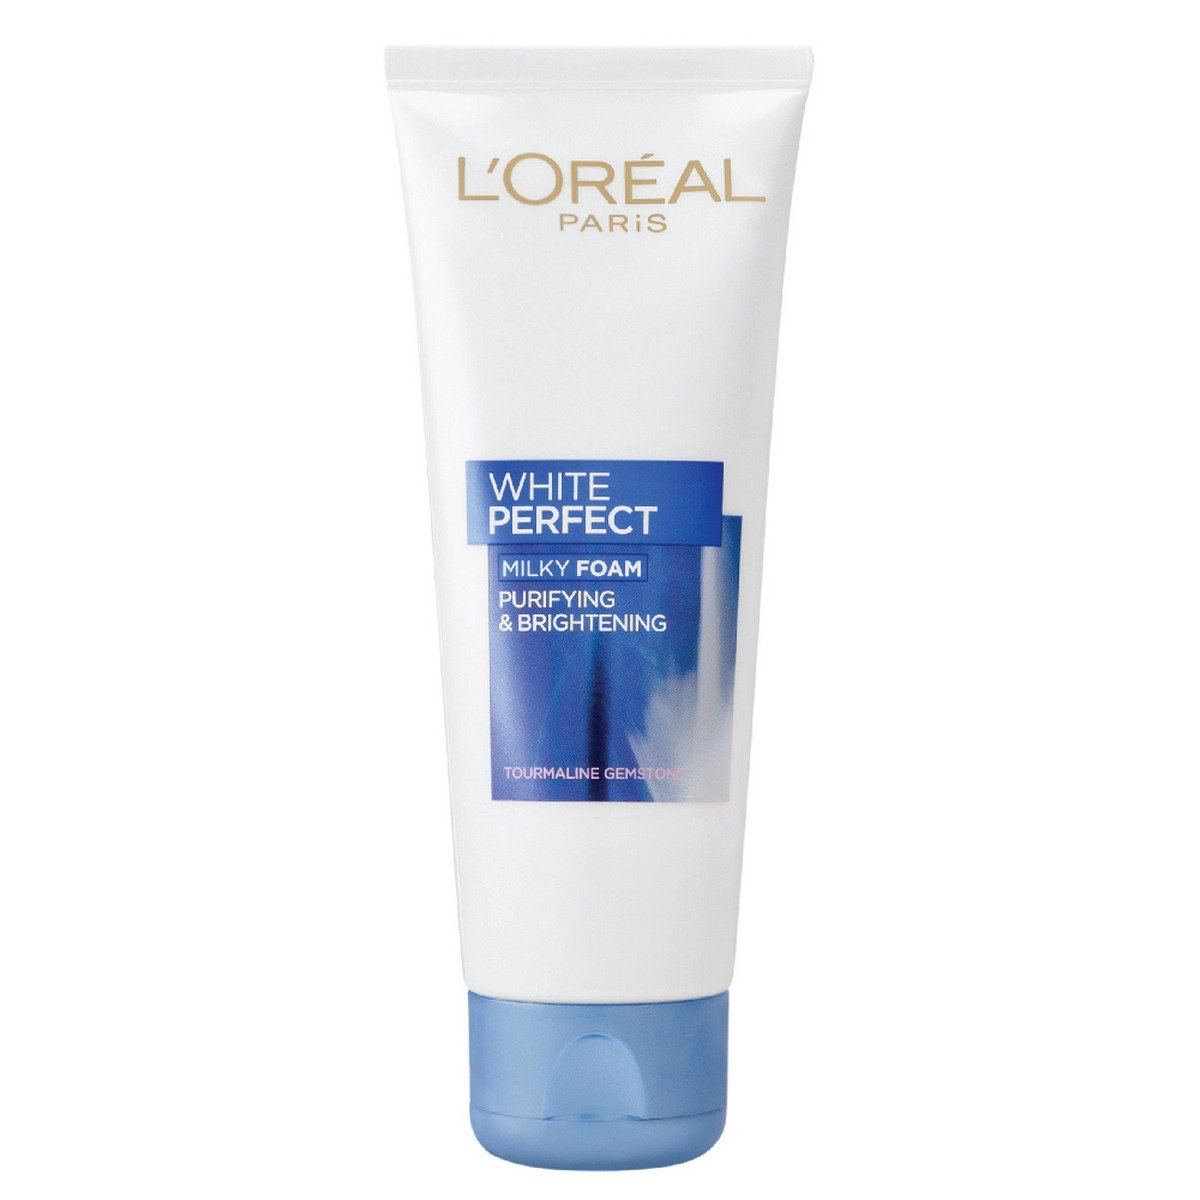 L'Oreal Paris White Perfect Milky Foam Facewash